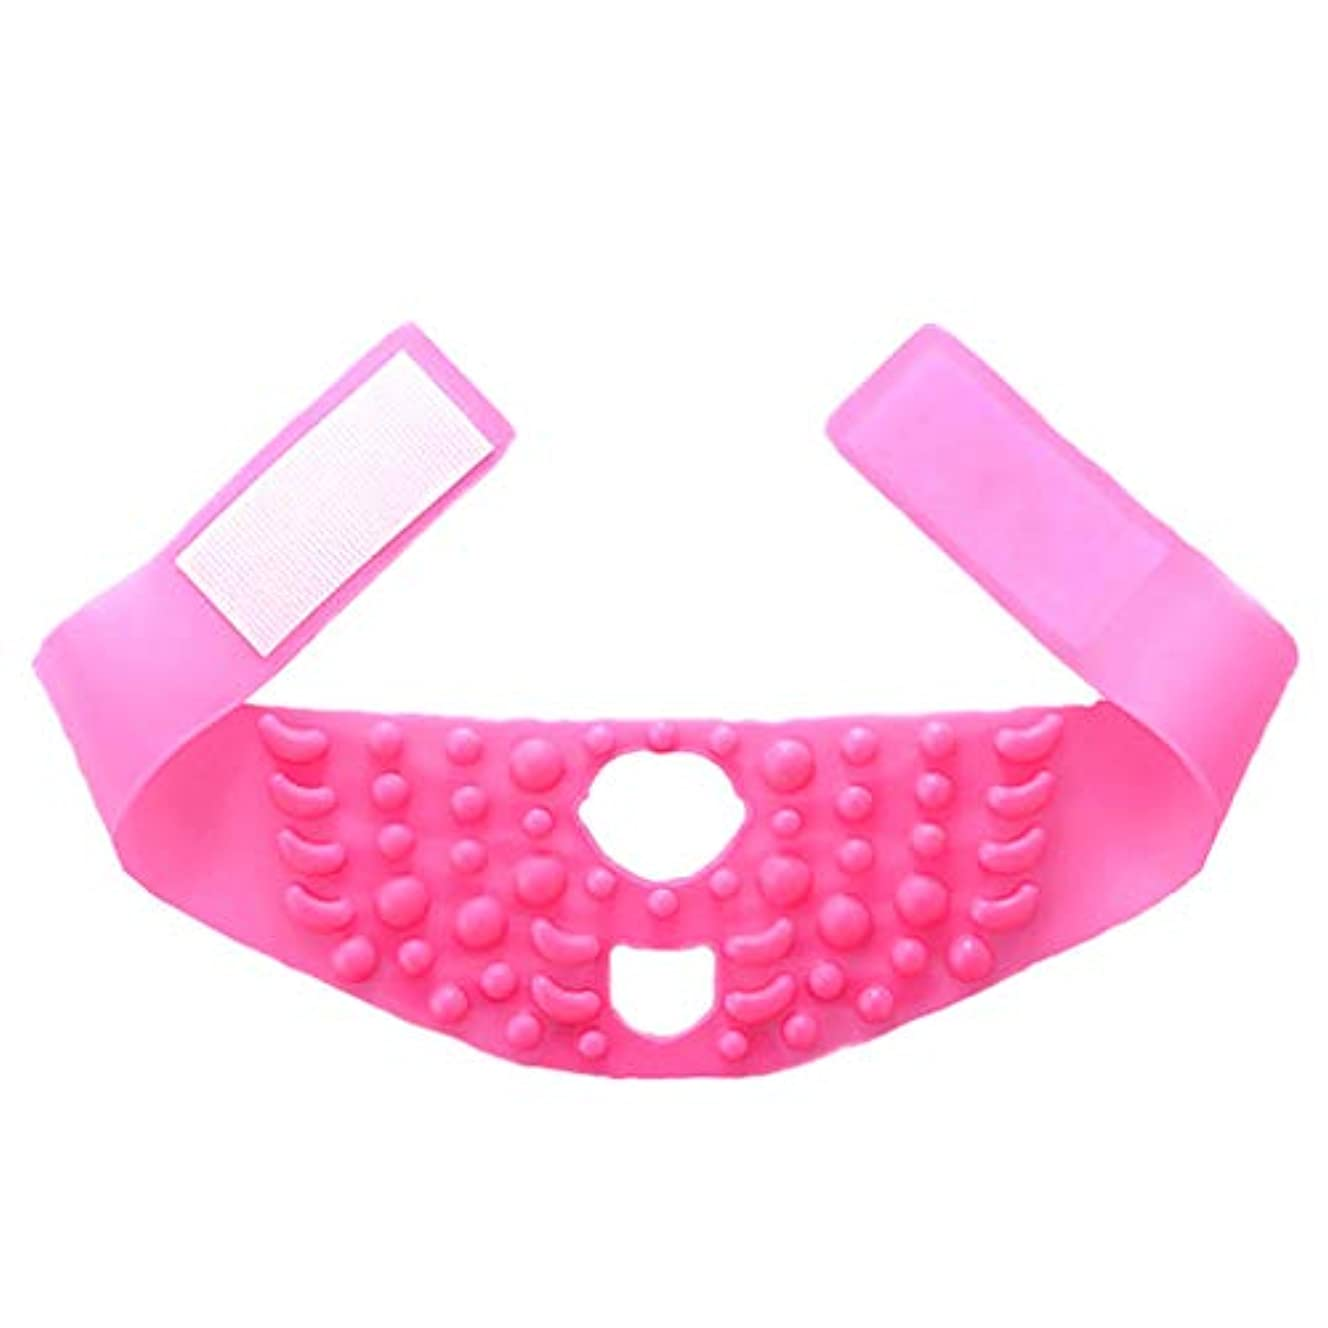 GLJJQMY 顔の持ち上がるマスクのあごのリボンのシリコーンVのマスクのマスク強力な包帯Vの表面の人工物小さいVの顔の包帯顔および首の持ち上がるピンクのシリコーンの包帯 顔用整形マスク